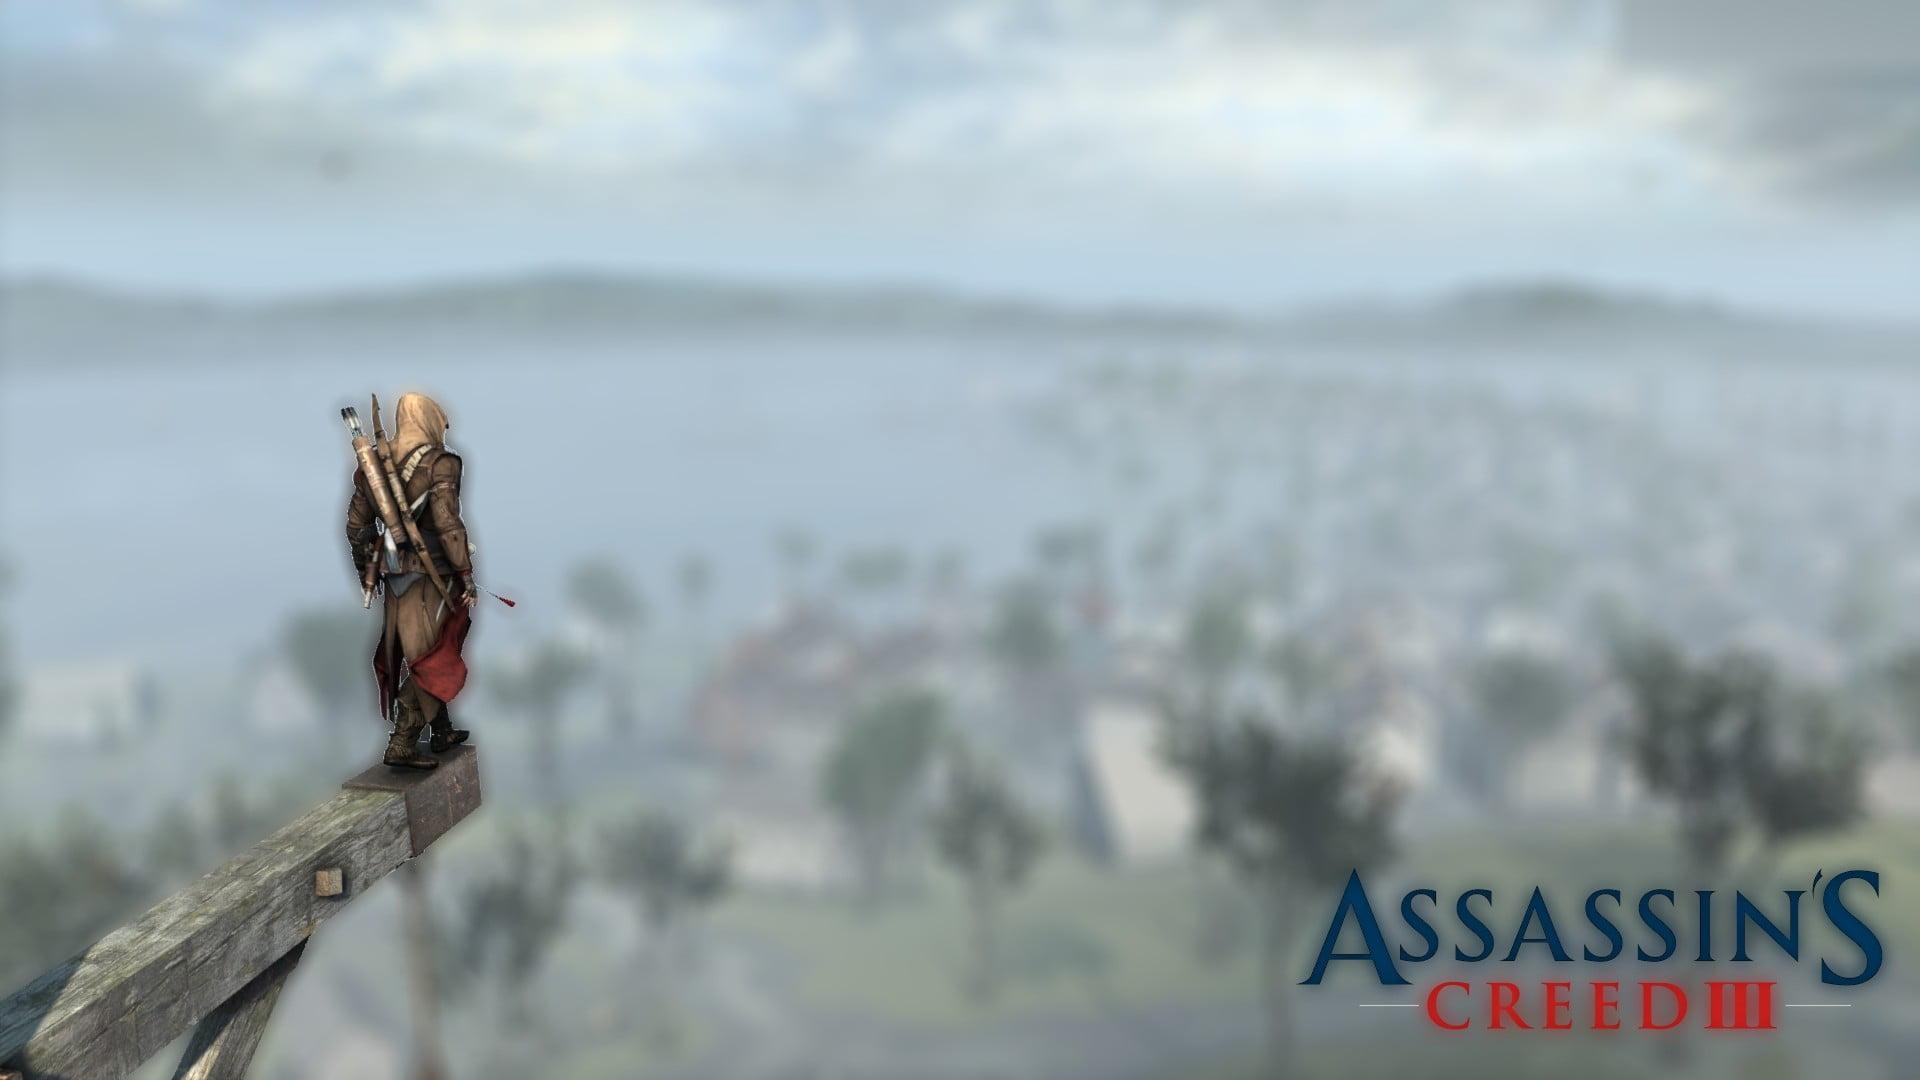 Assassins Creed Revelations Hook Blade 1920x1080 Wallpaper Teahub Io